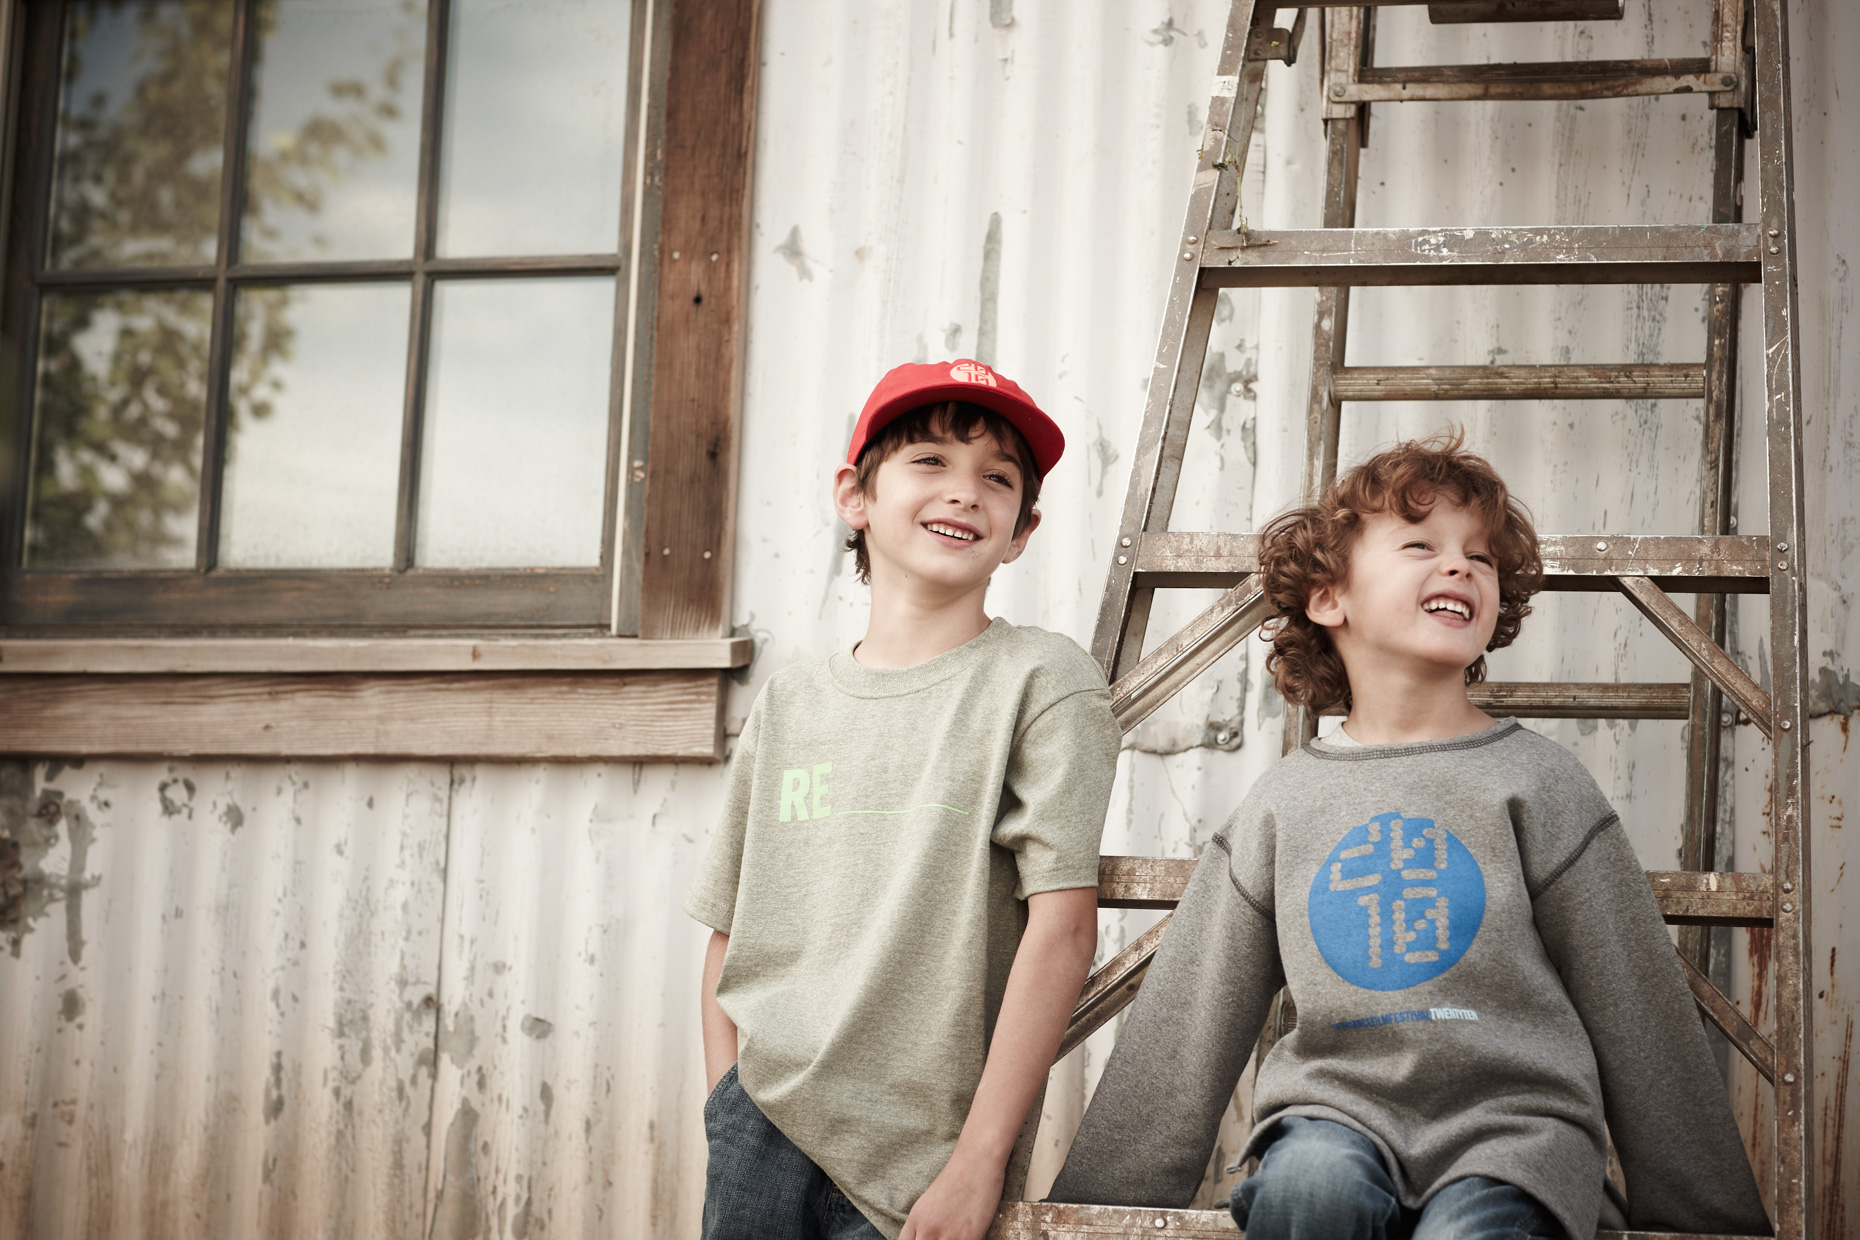 Portrait Photography Derek Israelsen Rustic Kids Advertisment